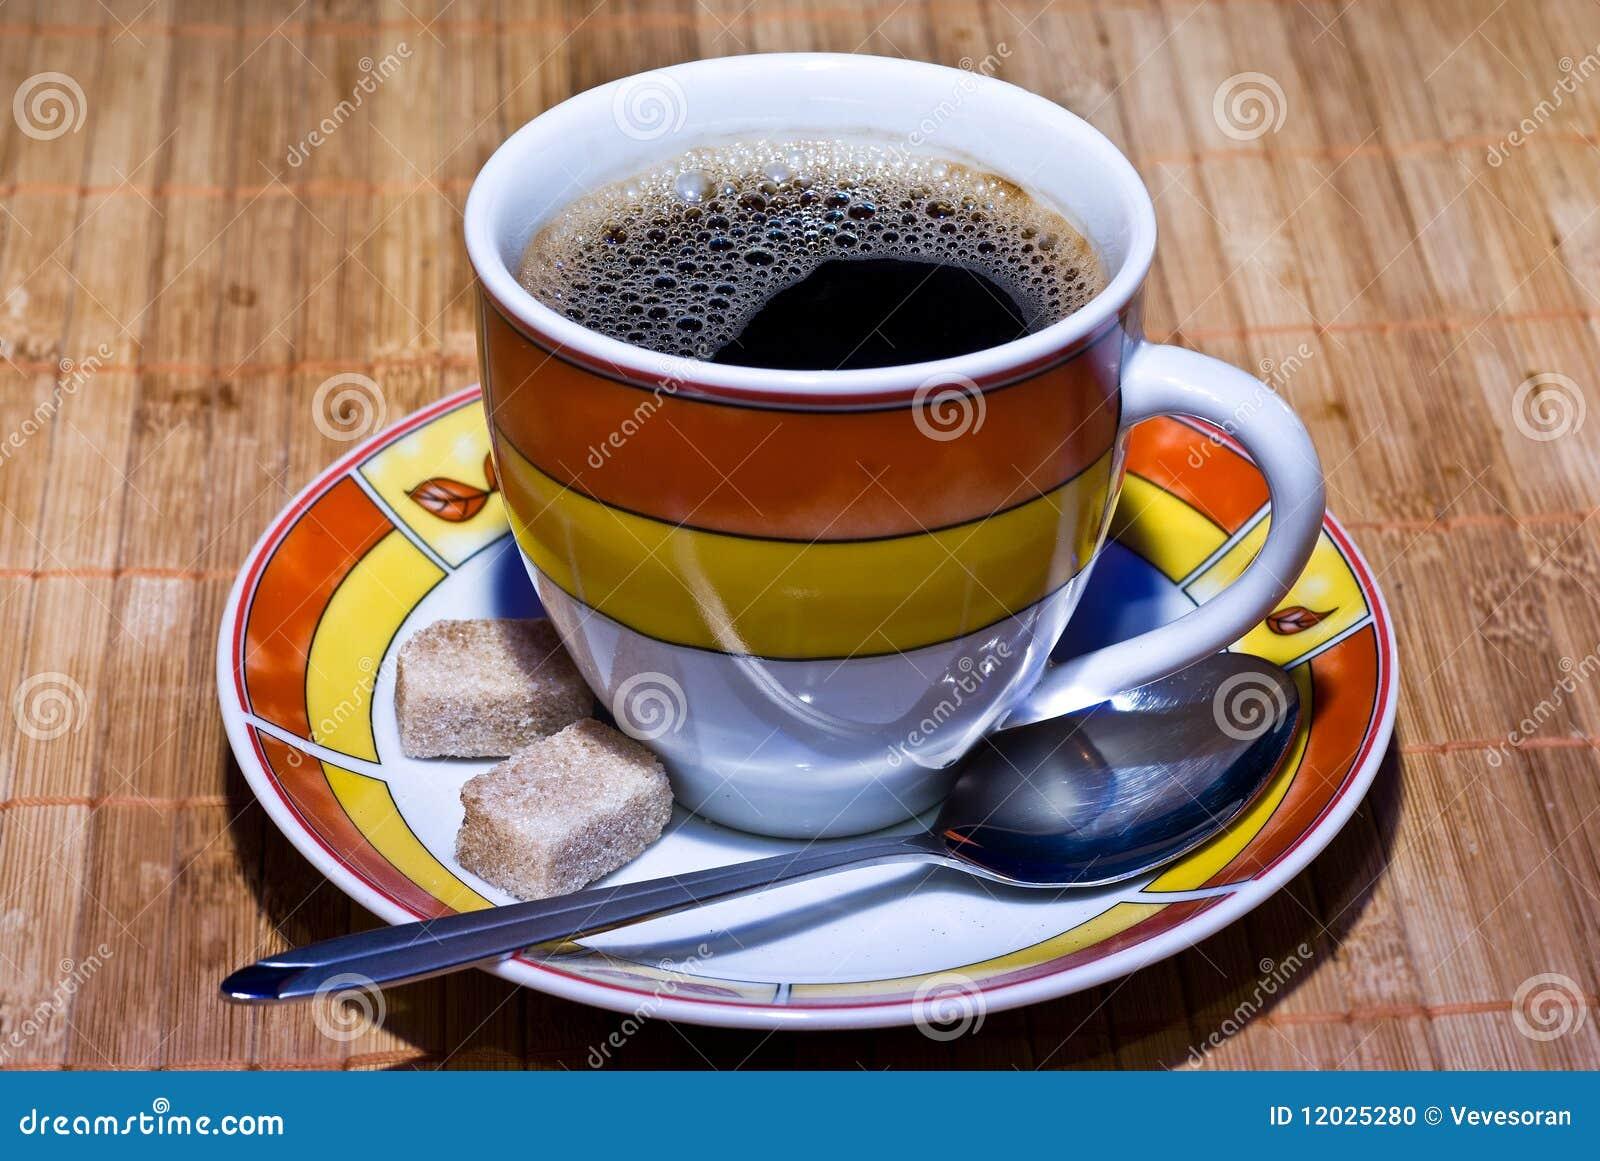 Cofee and sugar